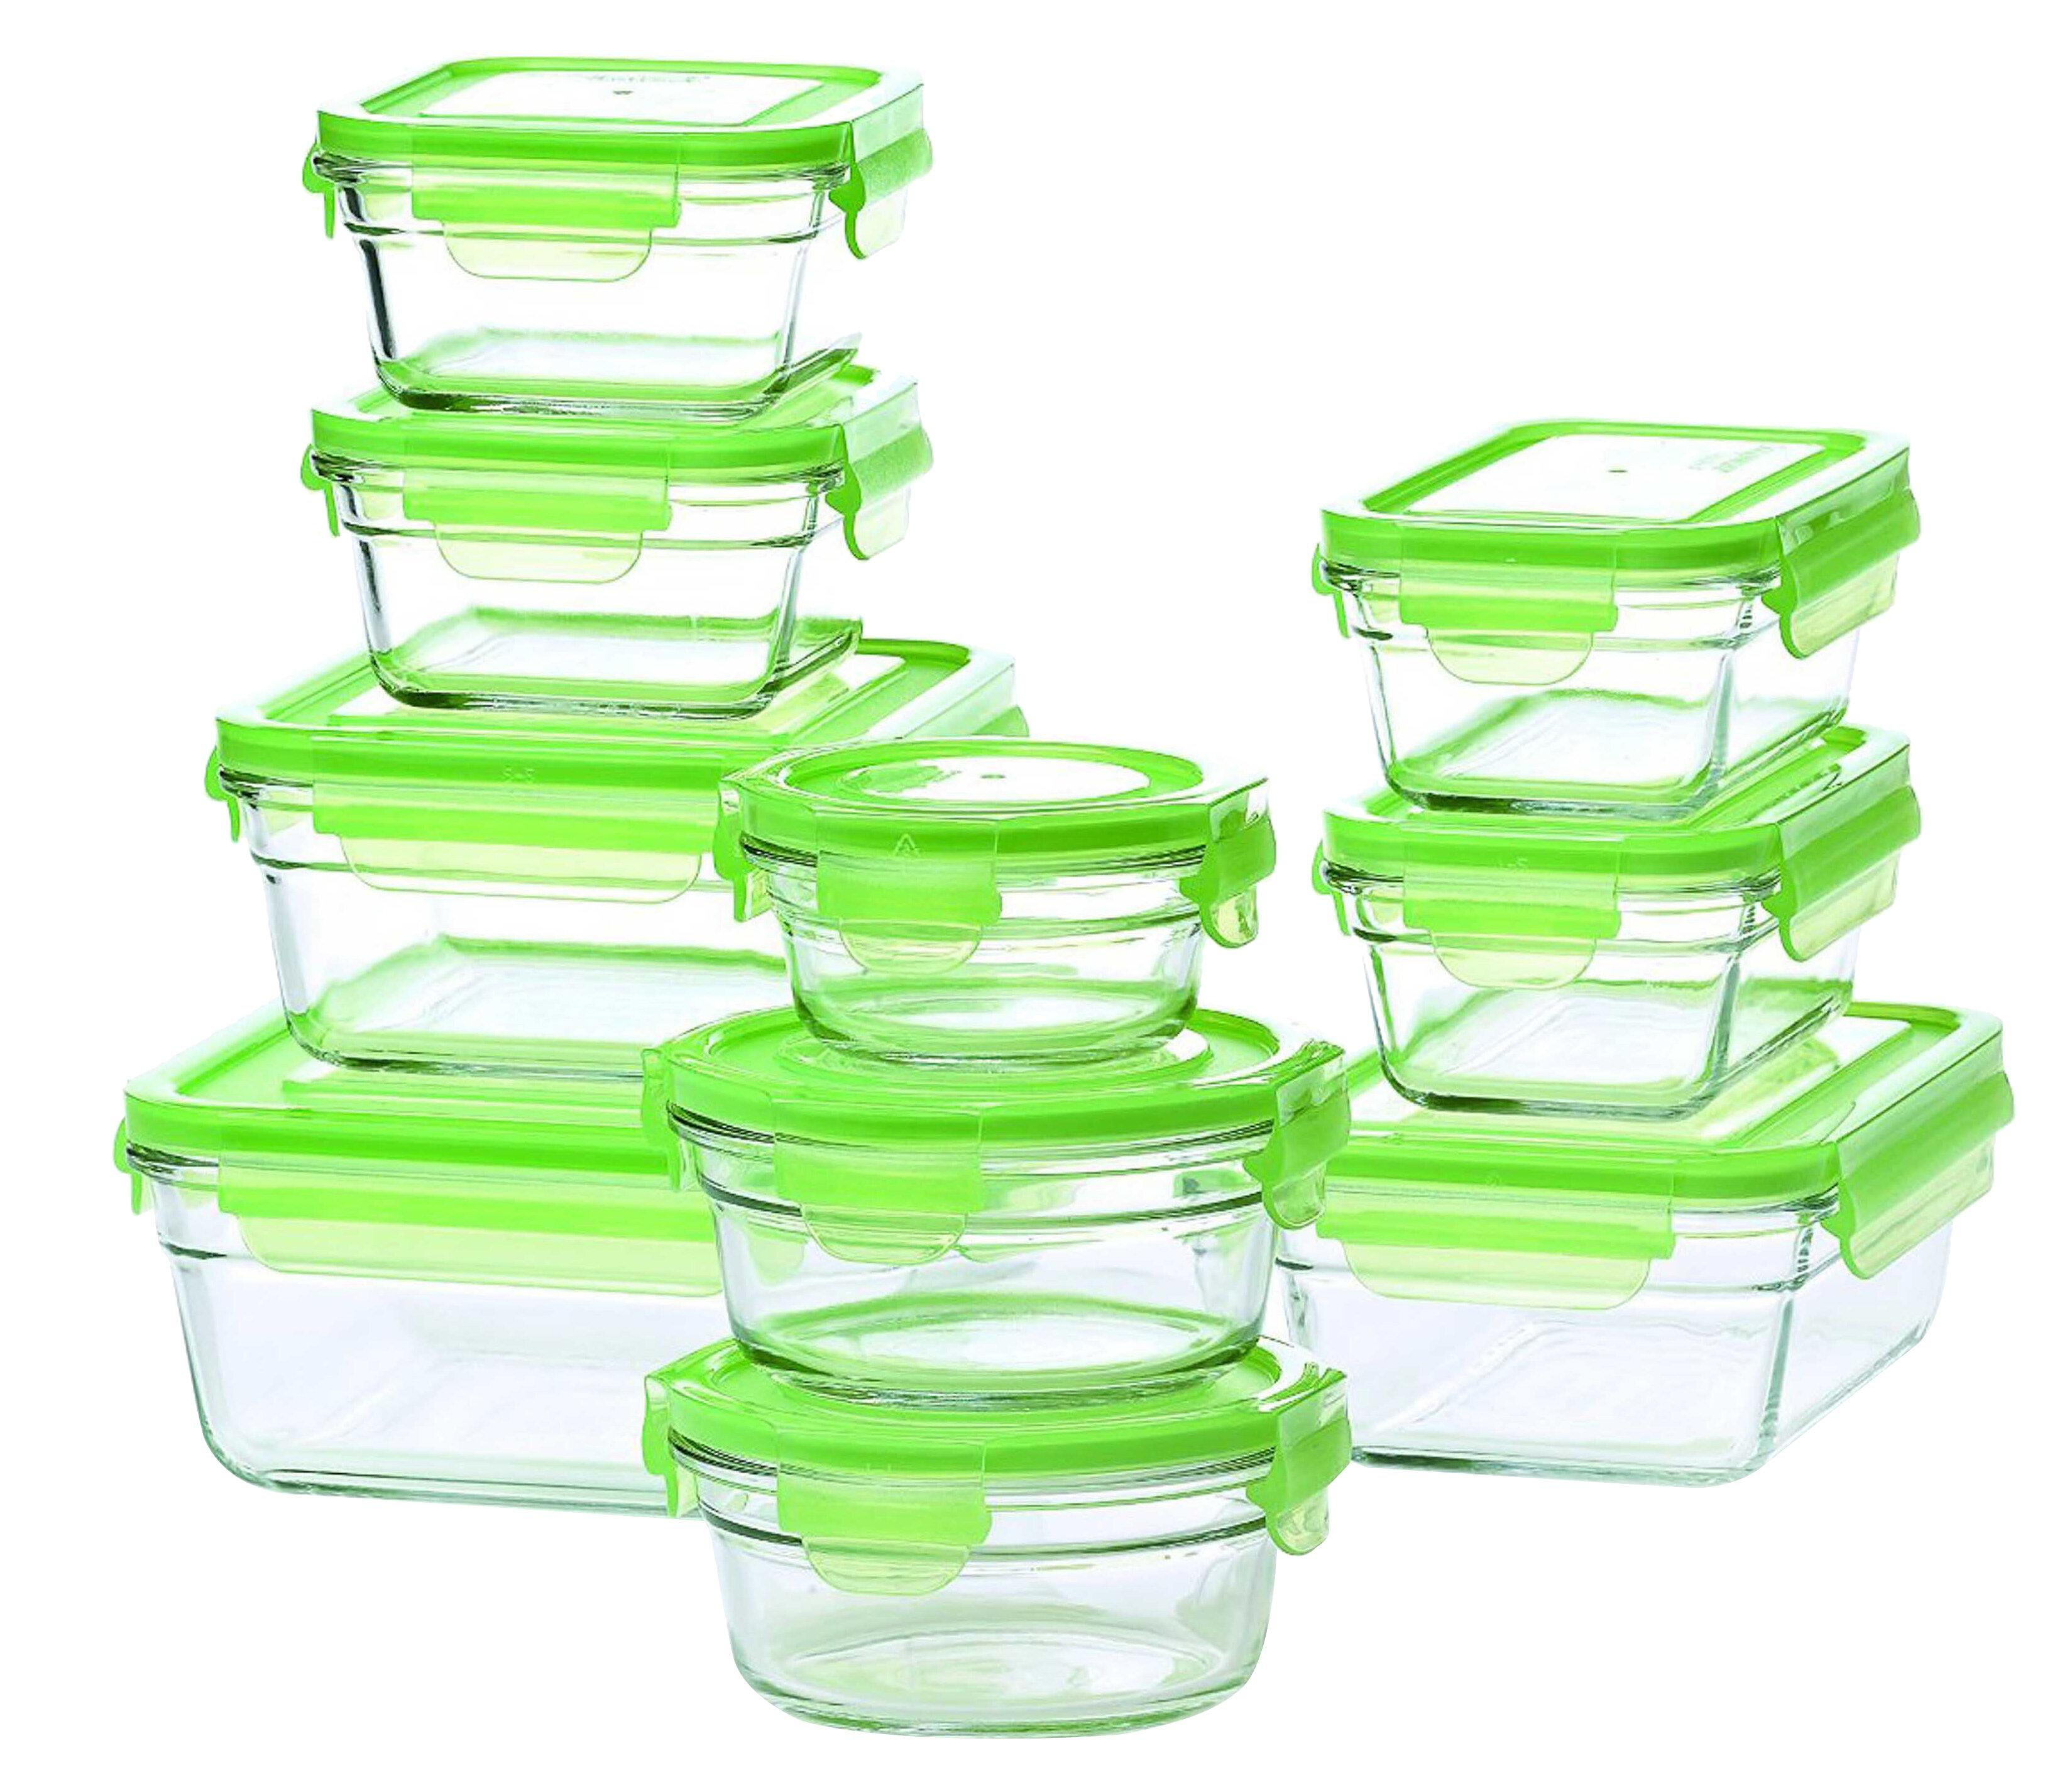 Glasslock Glasslock 10 Container Food Storage Set U0026 Reviews | Wayfair